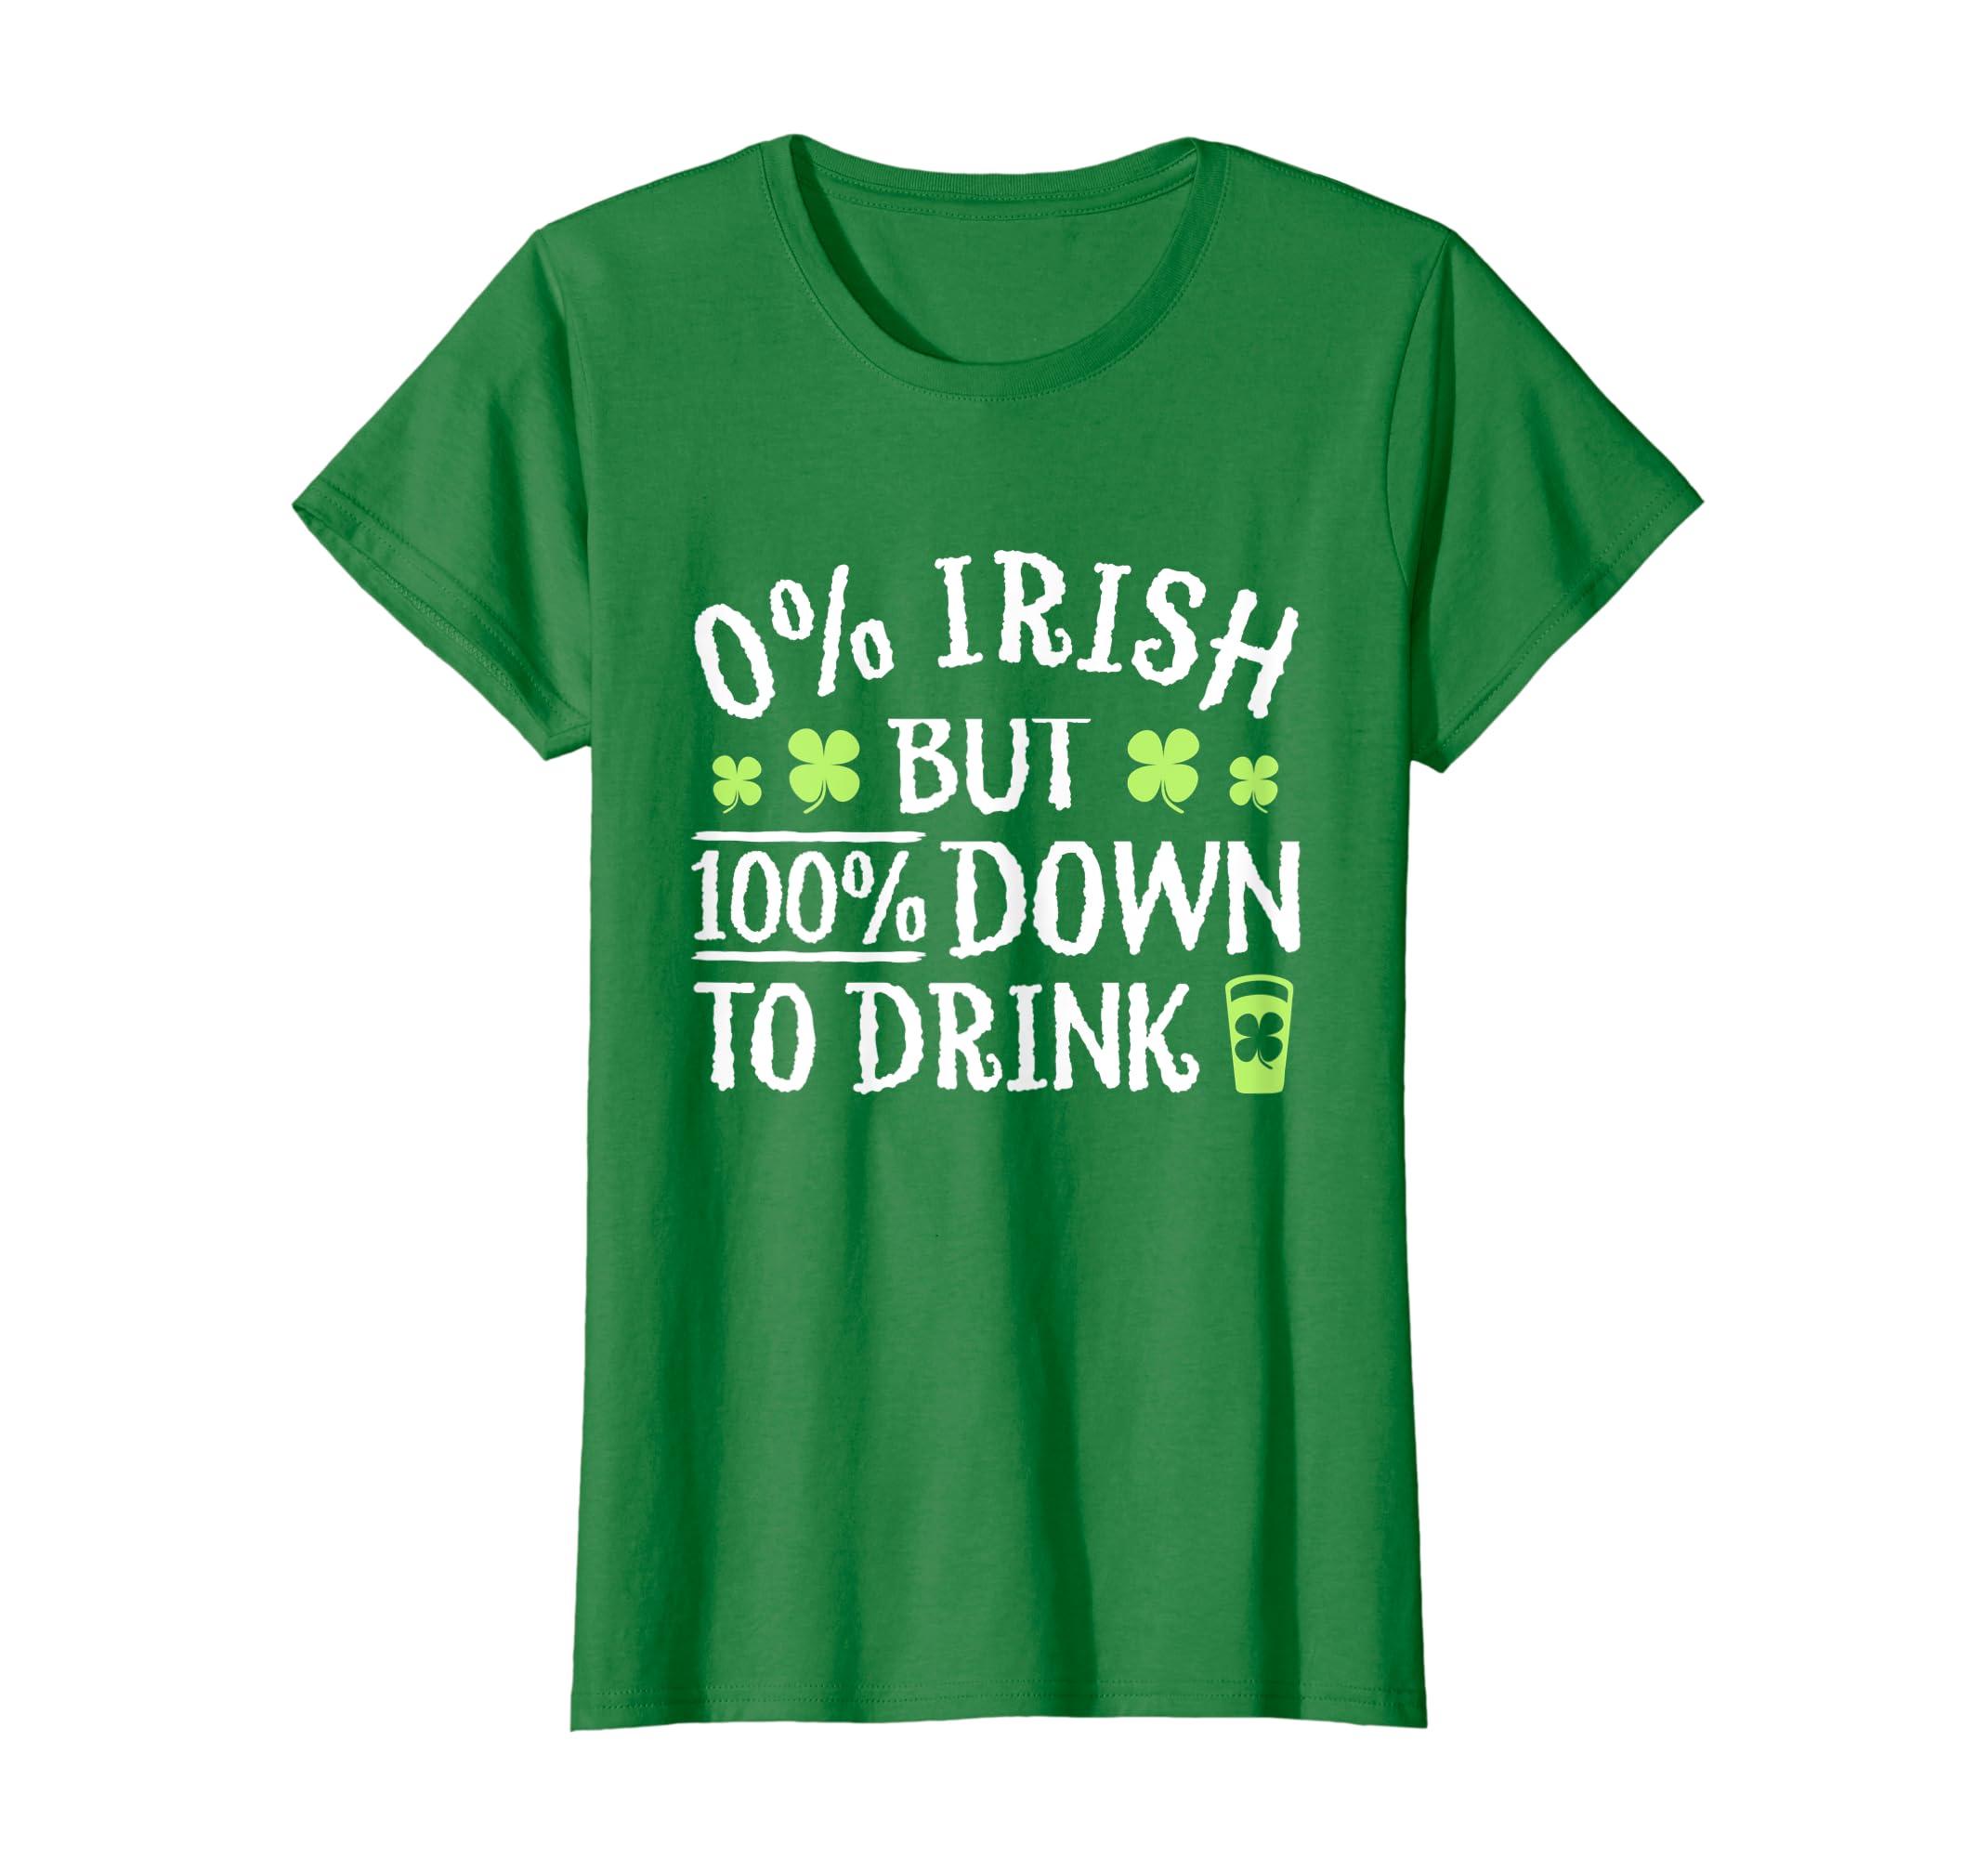 d02c29e18ae2c Amazon.com: 0% Irish 100% Down To Drink T-Shirt - St Patrick's Day ...